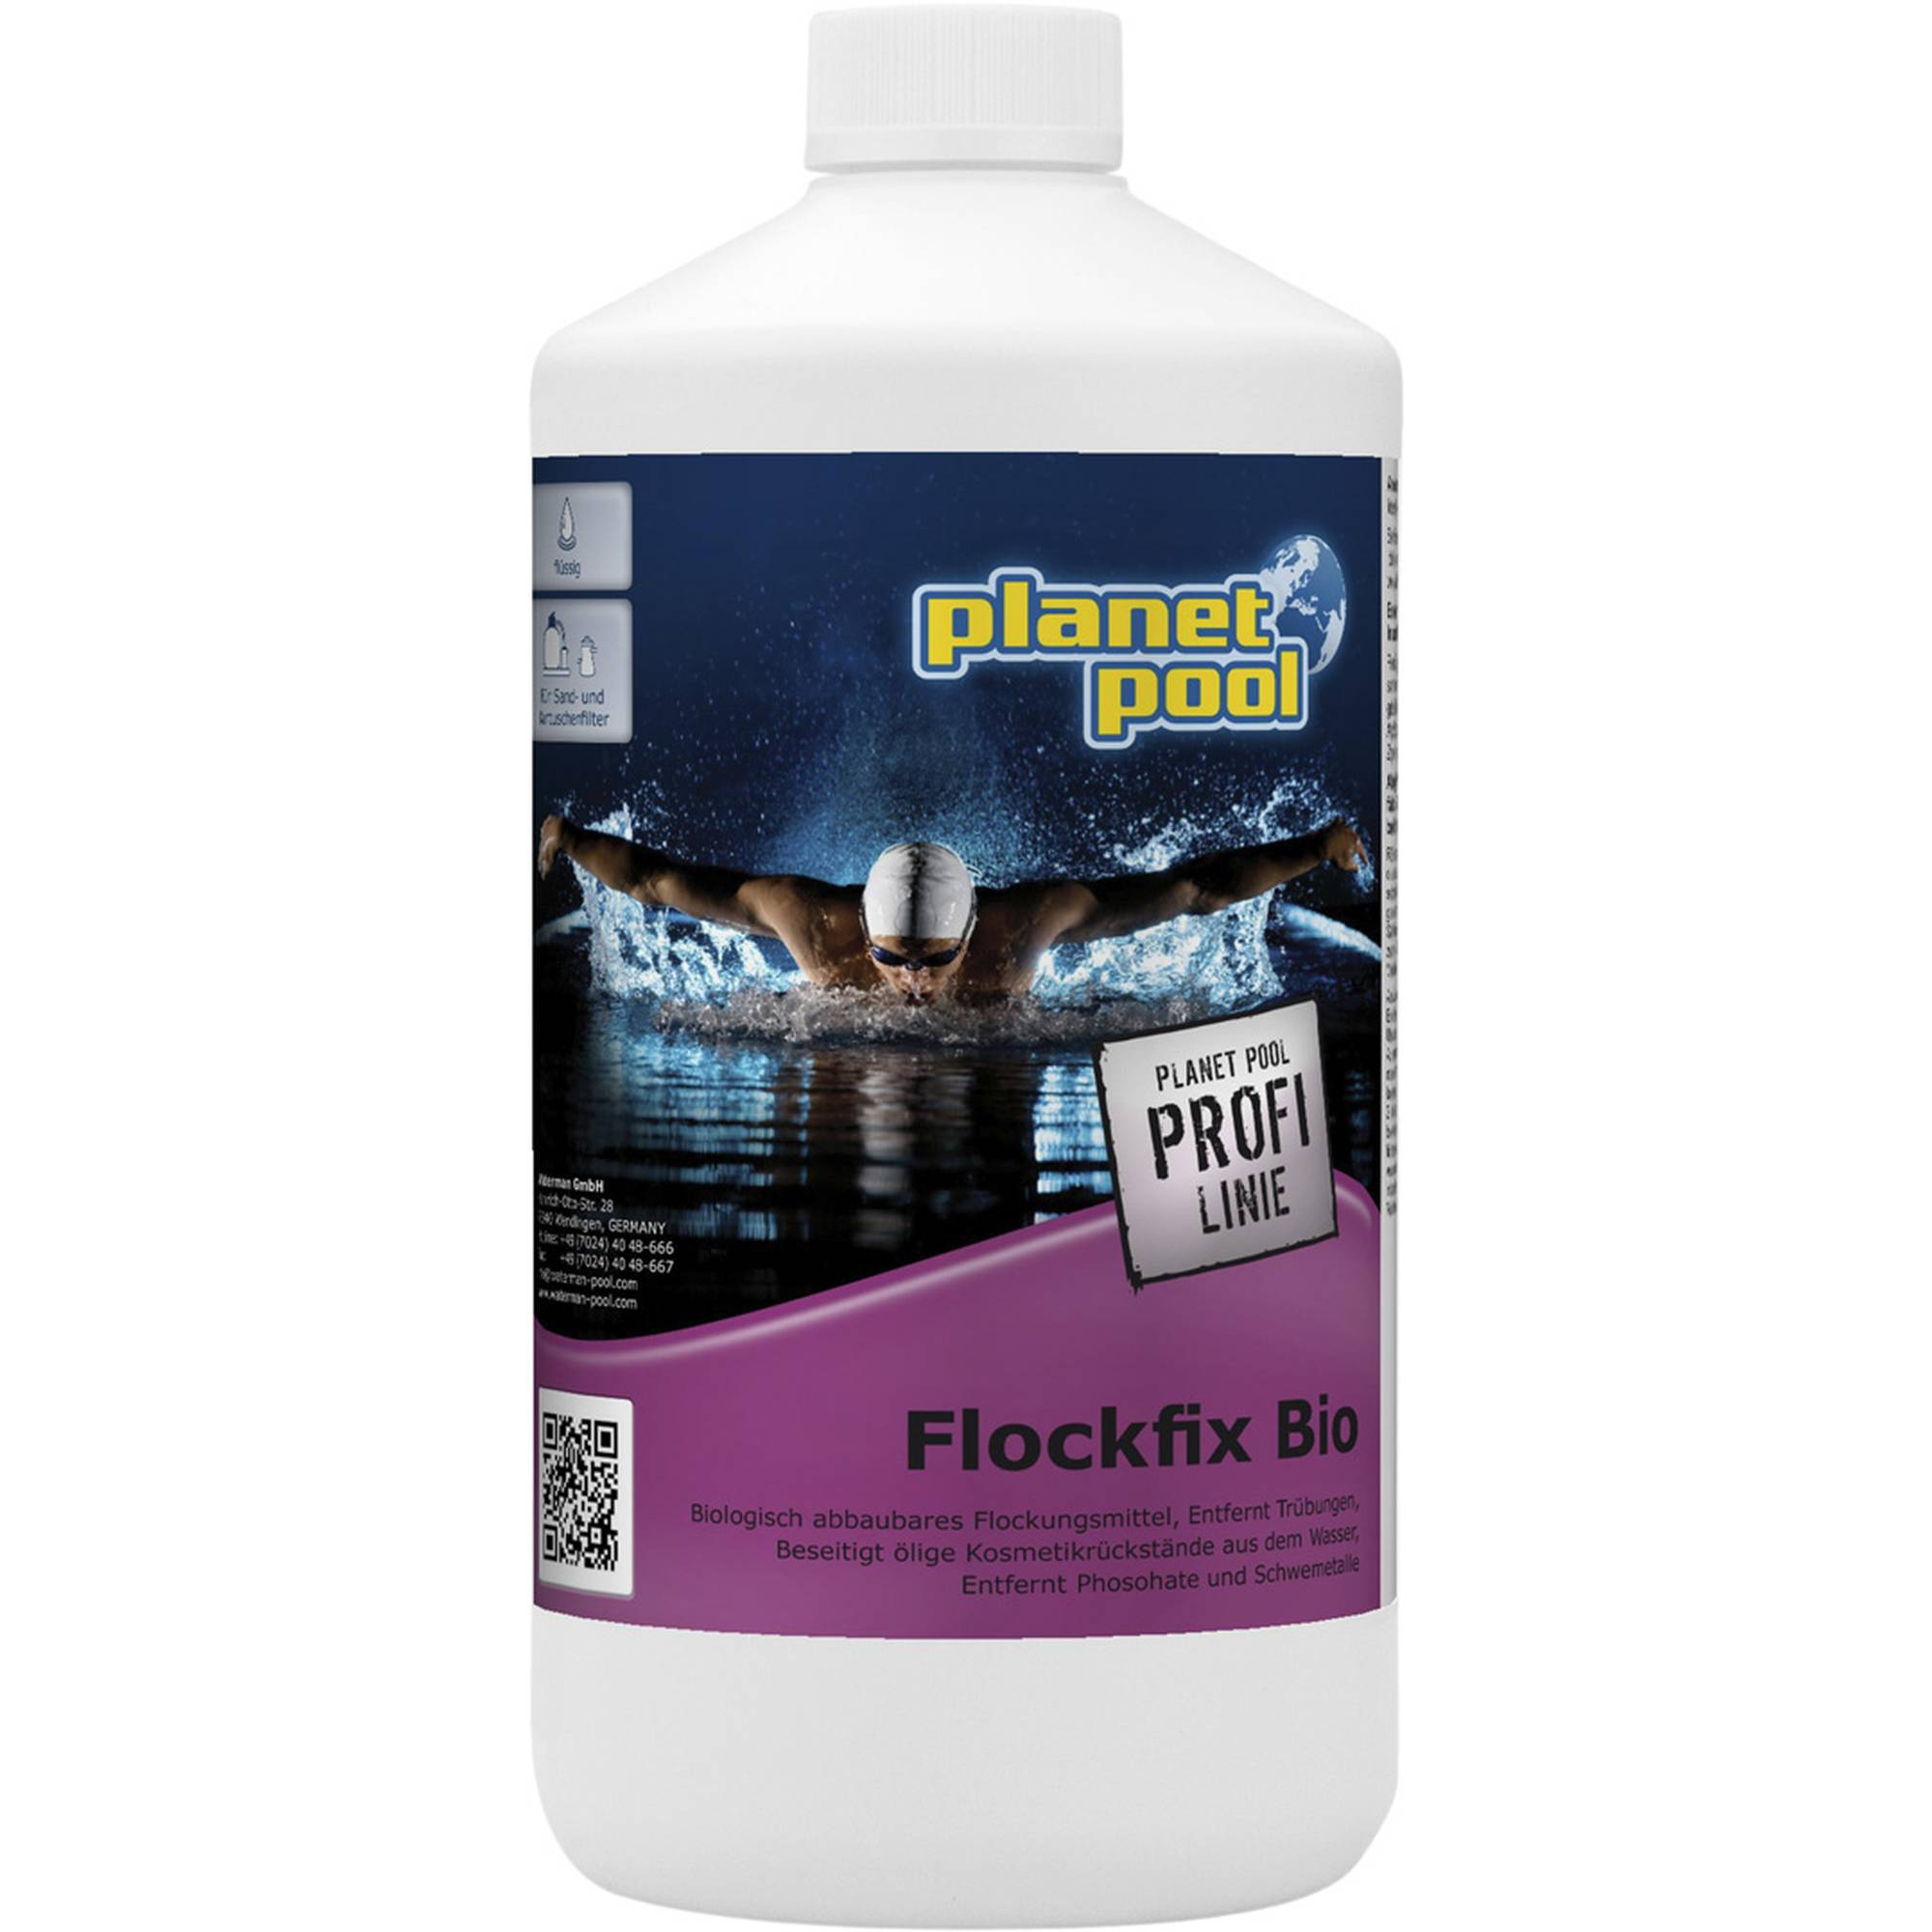 PLANET POOL - Profi Linie    Flockfix Bio 1 Liter